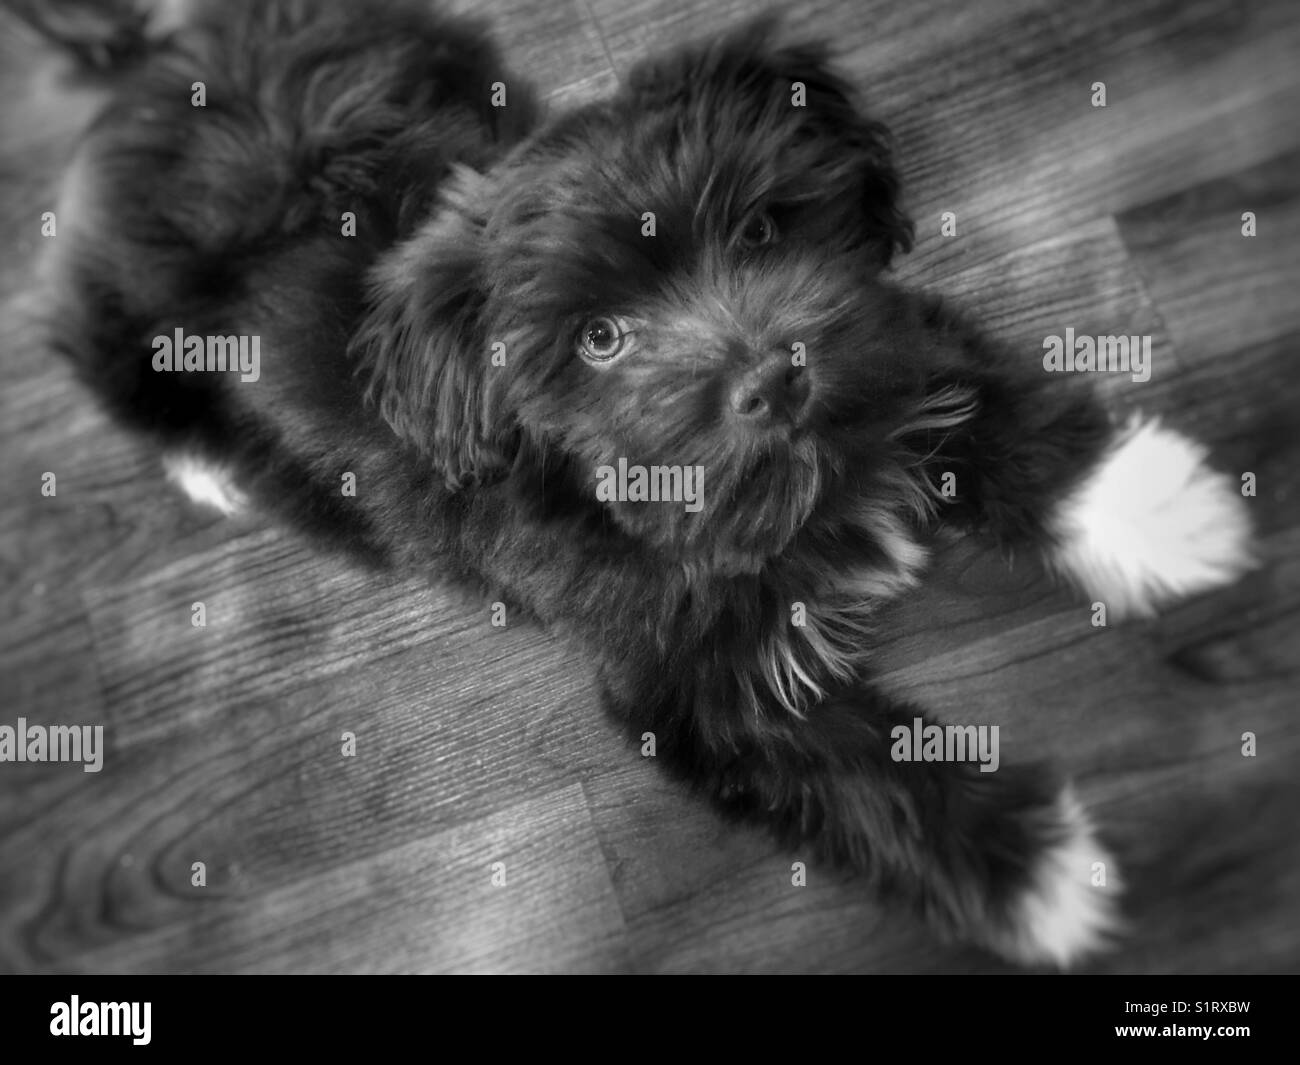 Havanese Puppy Stock Photos & Havanese Puppy Stock Images